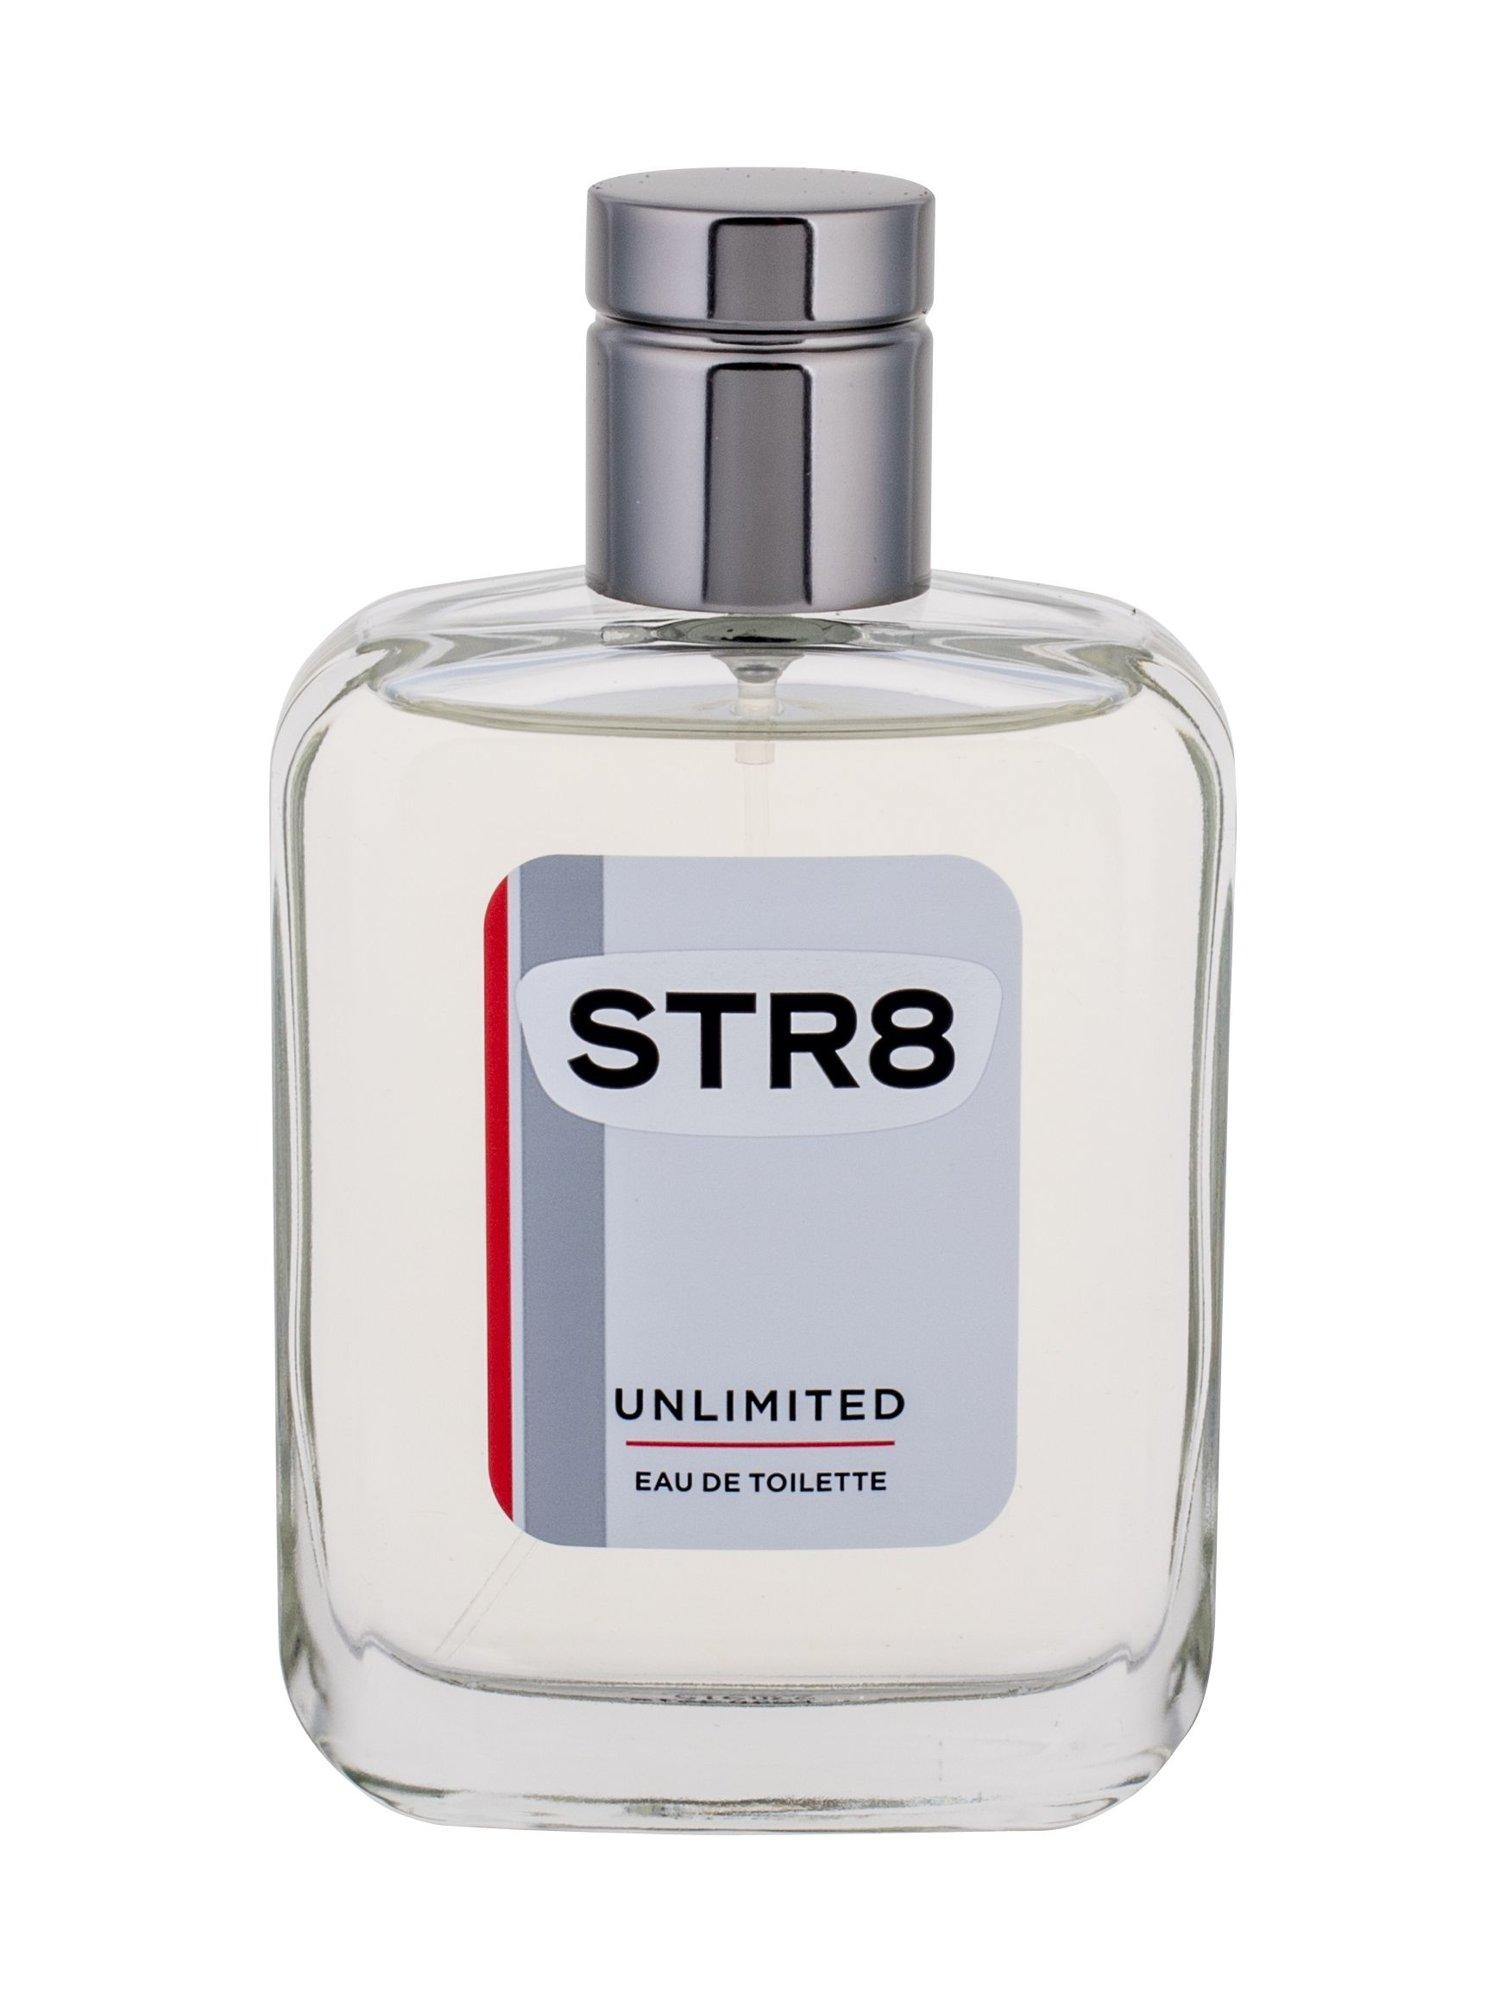 STR8 Unlimited EDT 100ml